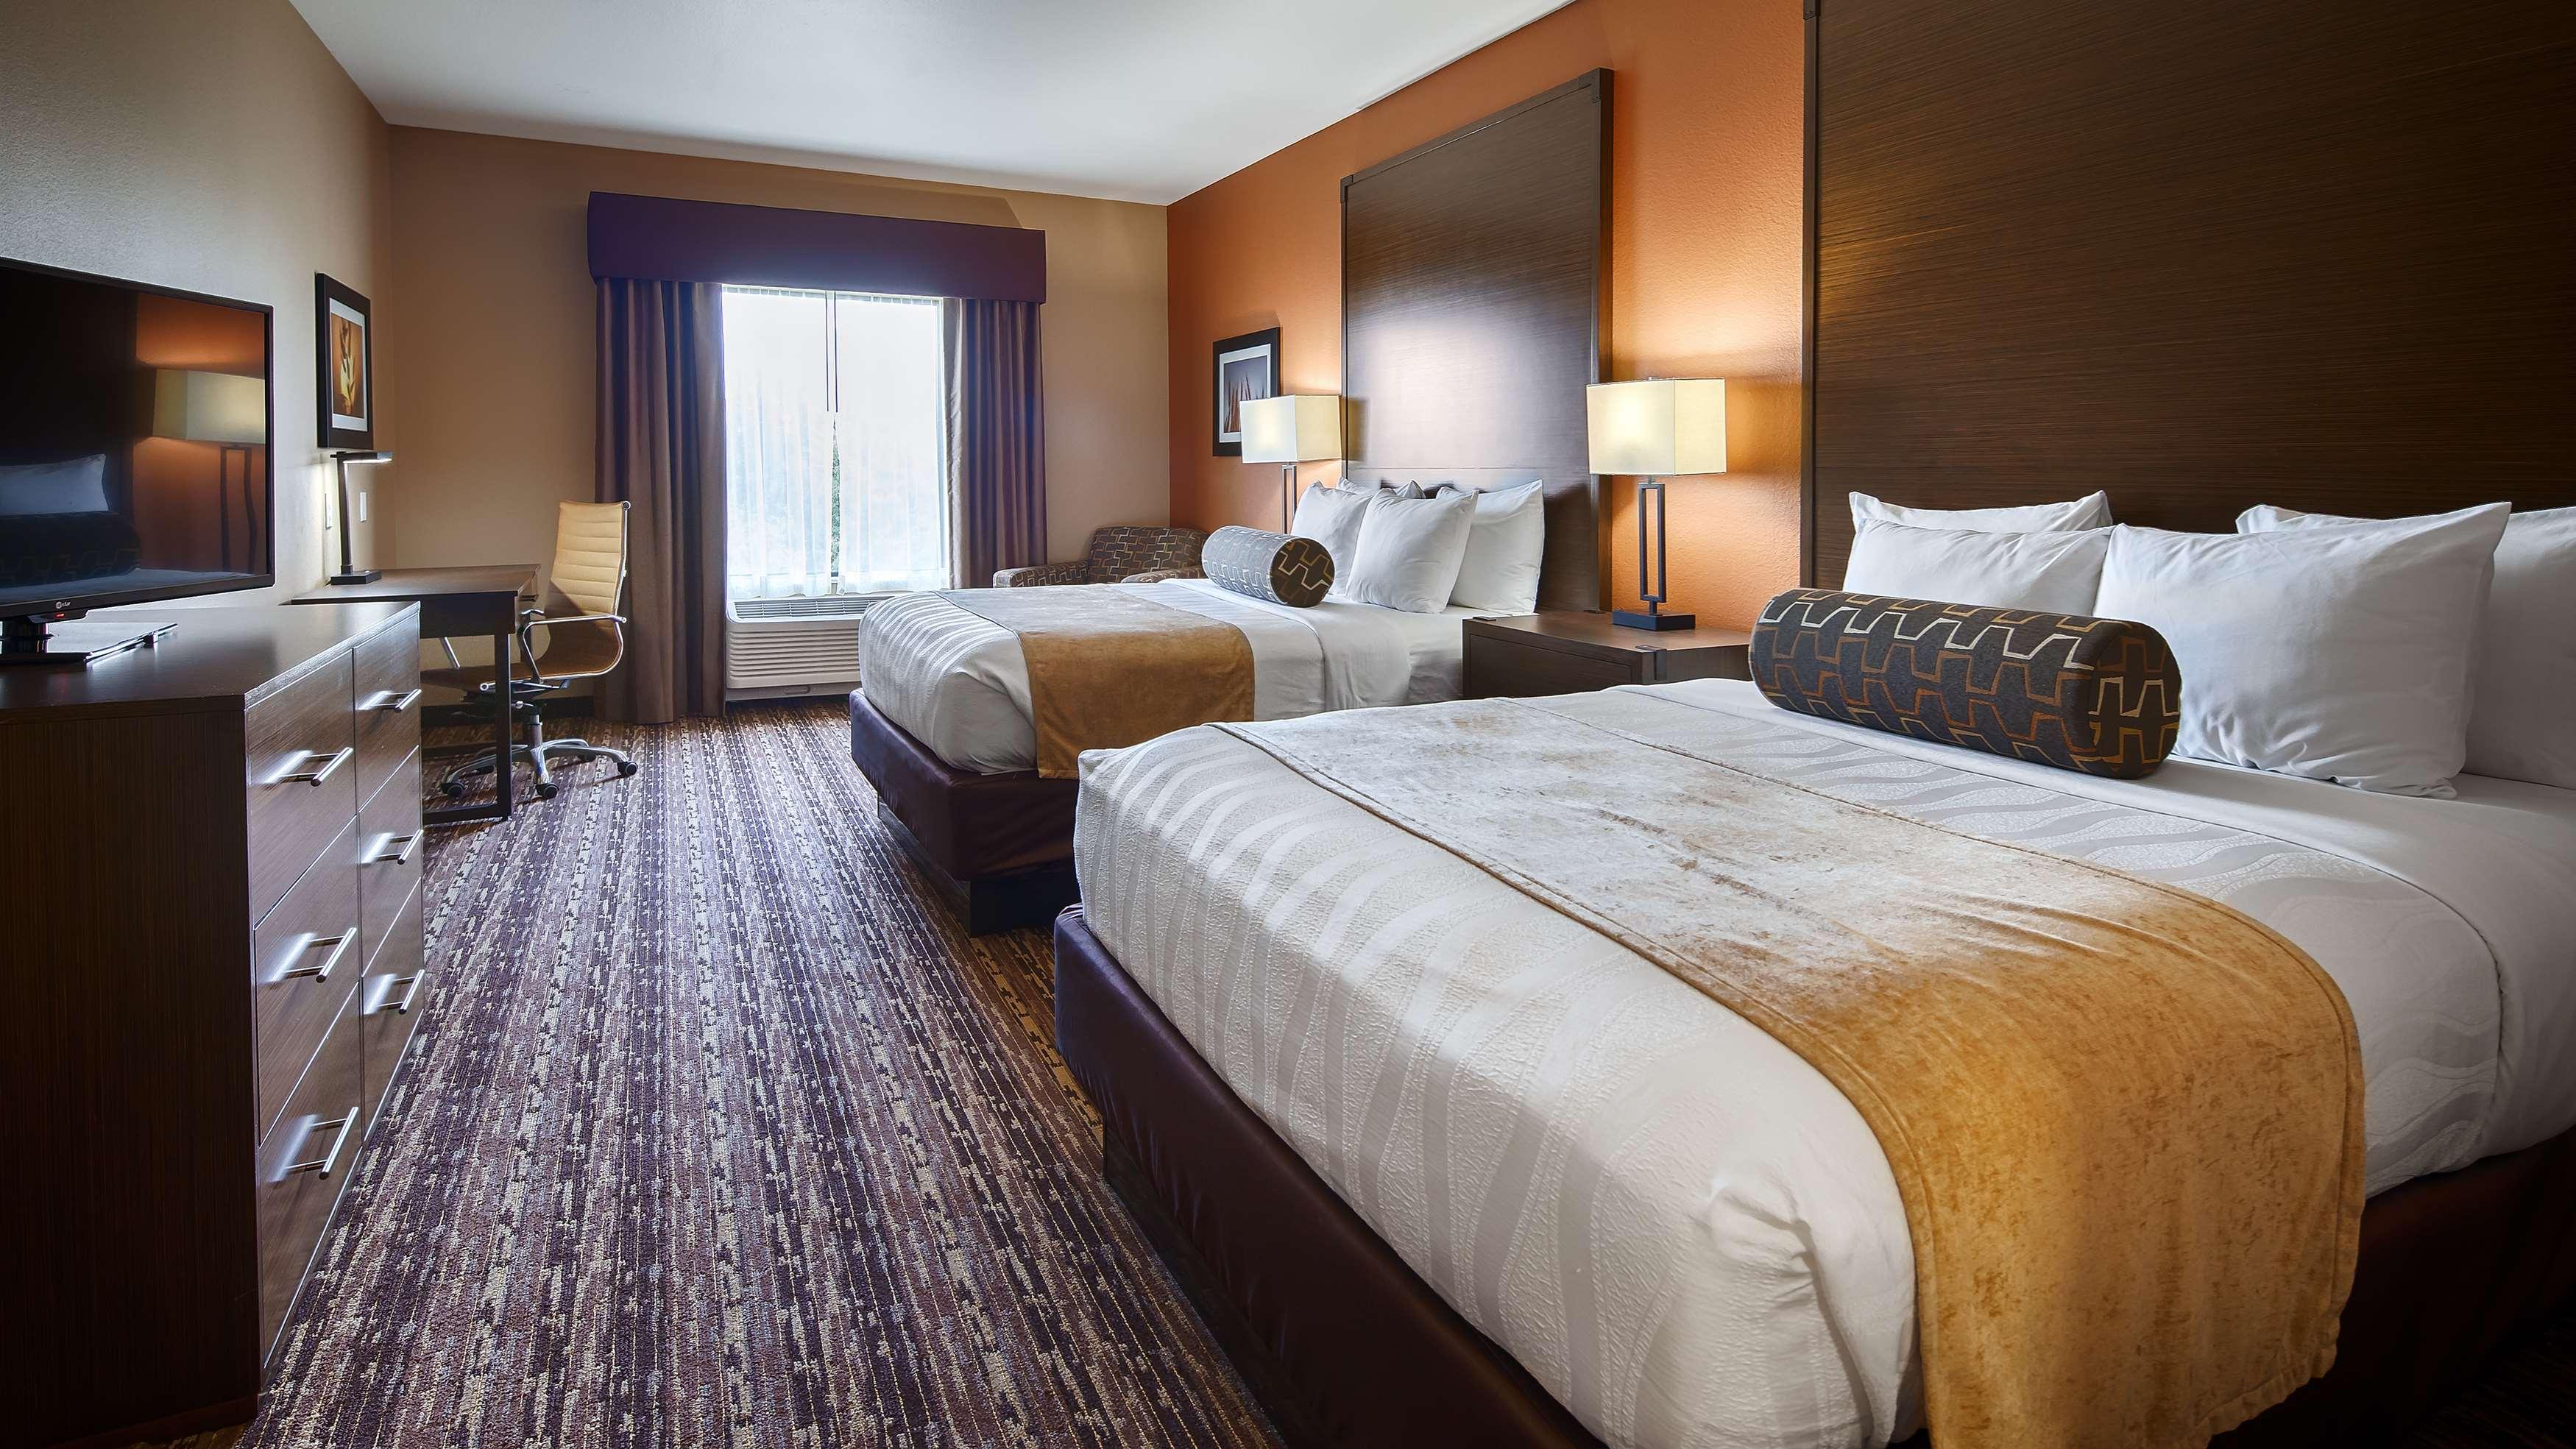 Best Western Plus Elmendorf Hotel image 14